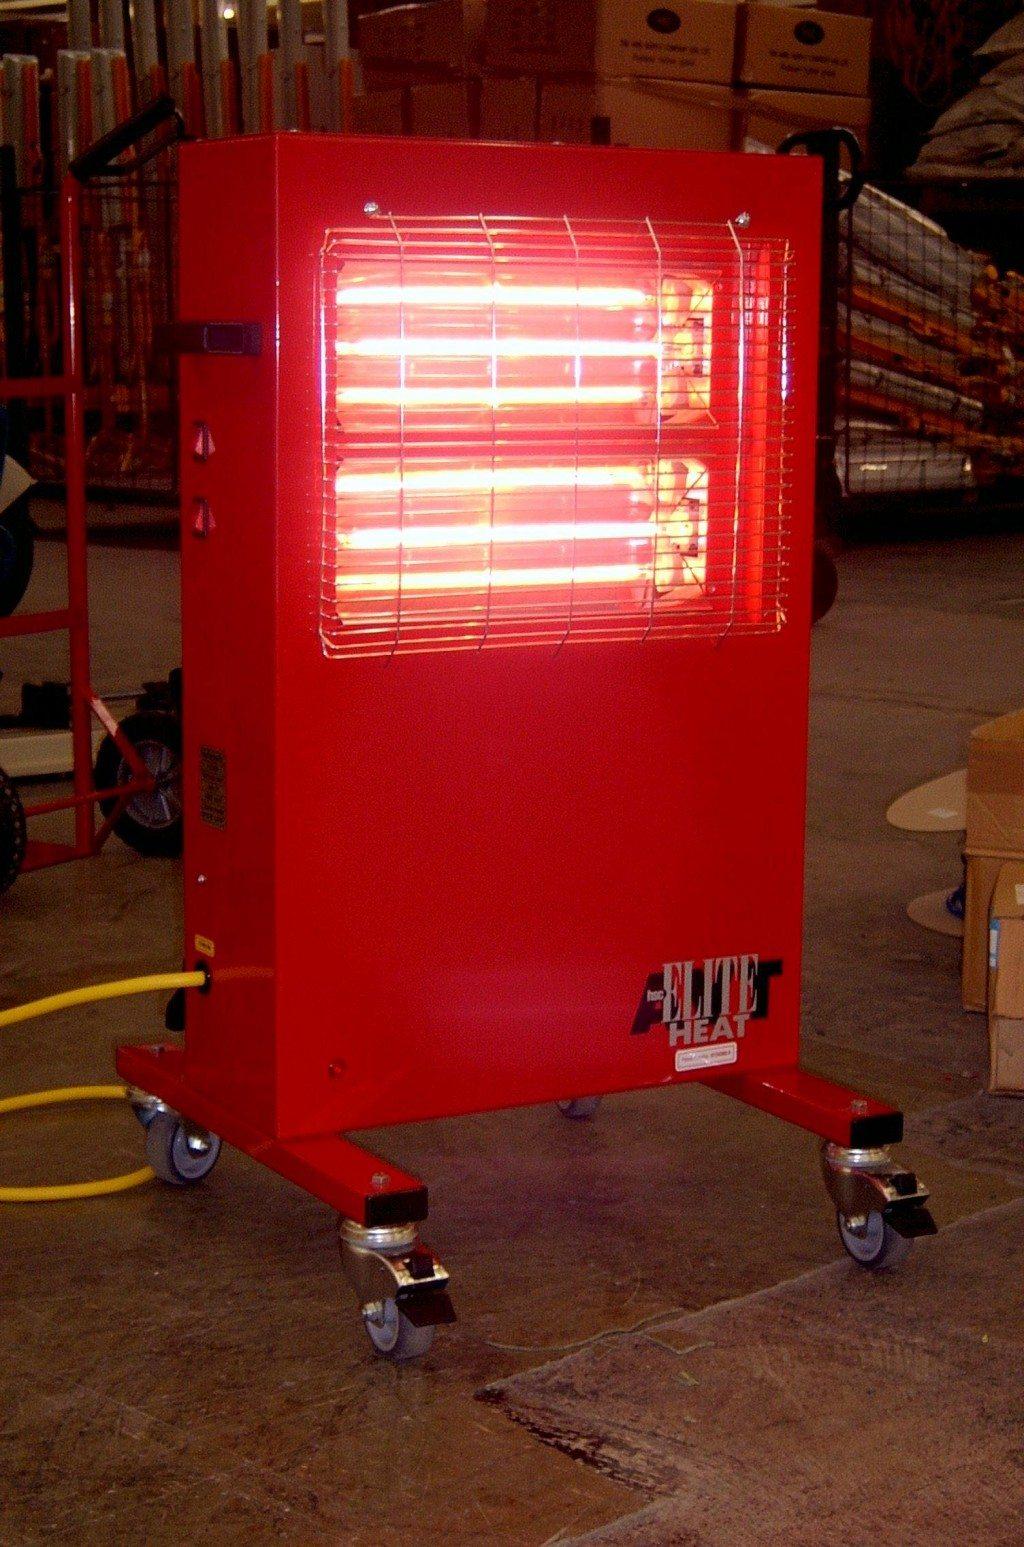 Heaters Mainline Plant Amp Tool Hire Swadlincote